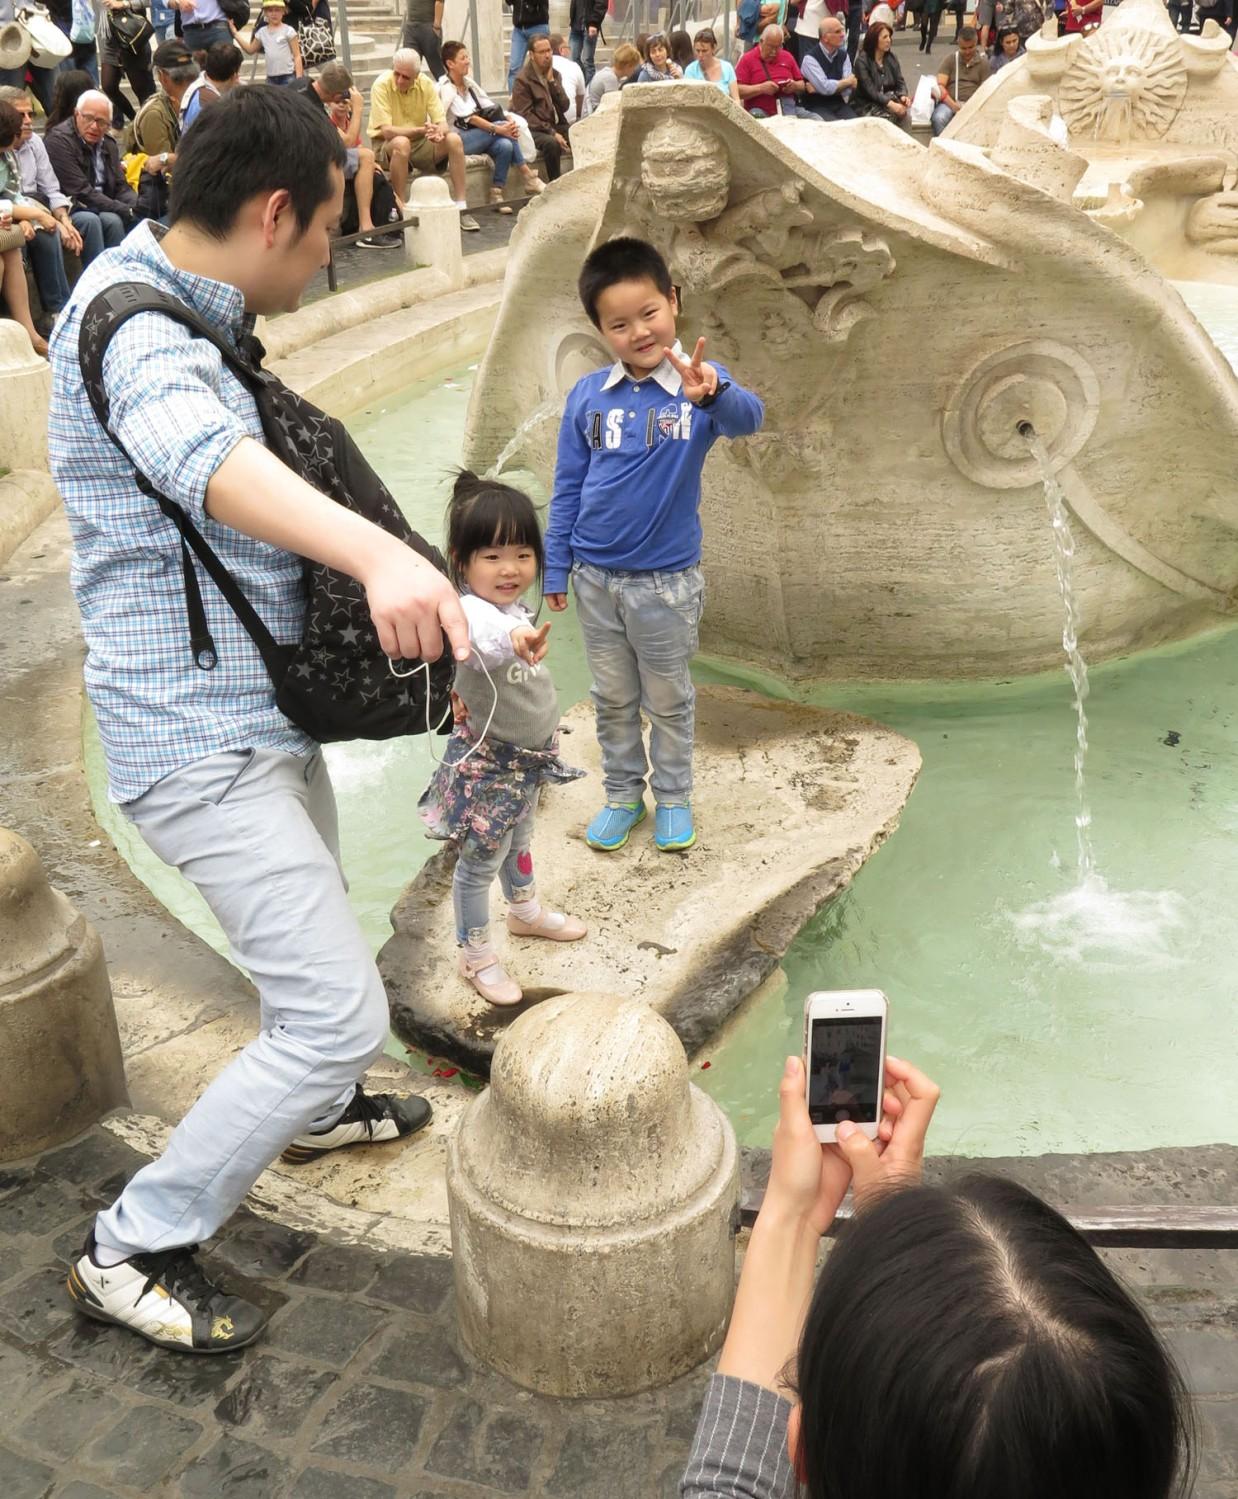 Italy-Rome-Barcaccia-Fountain